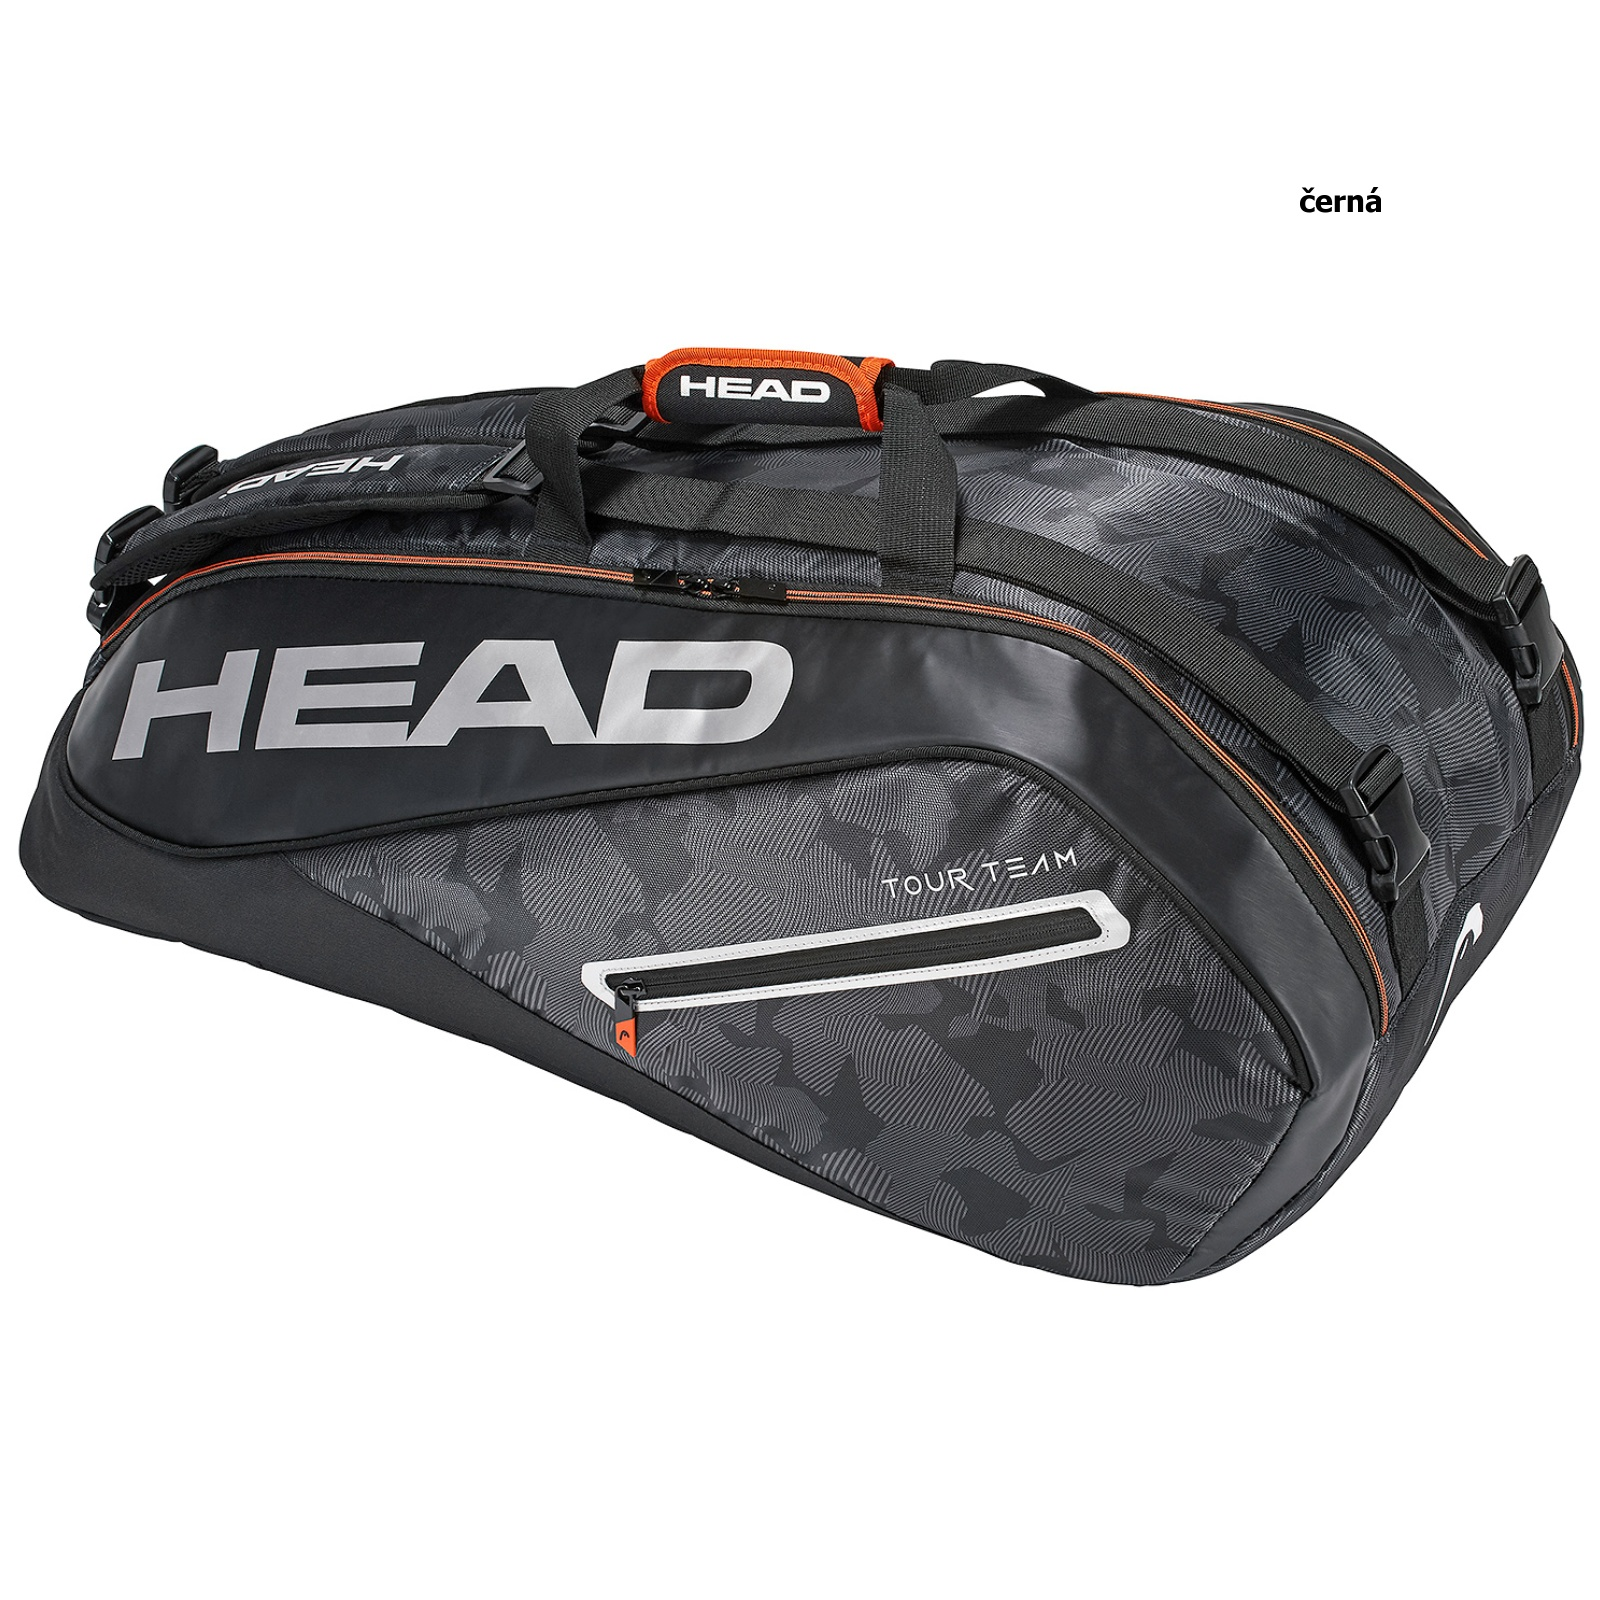 Tenisová taška HEAD Tour 9R Supercombi - čierna